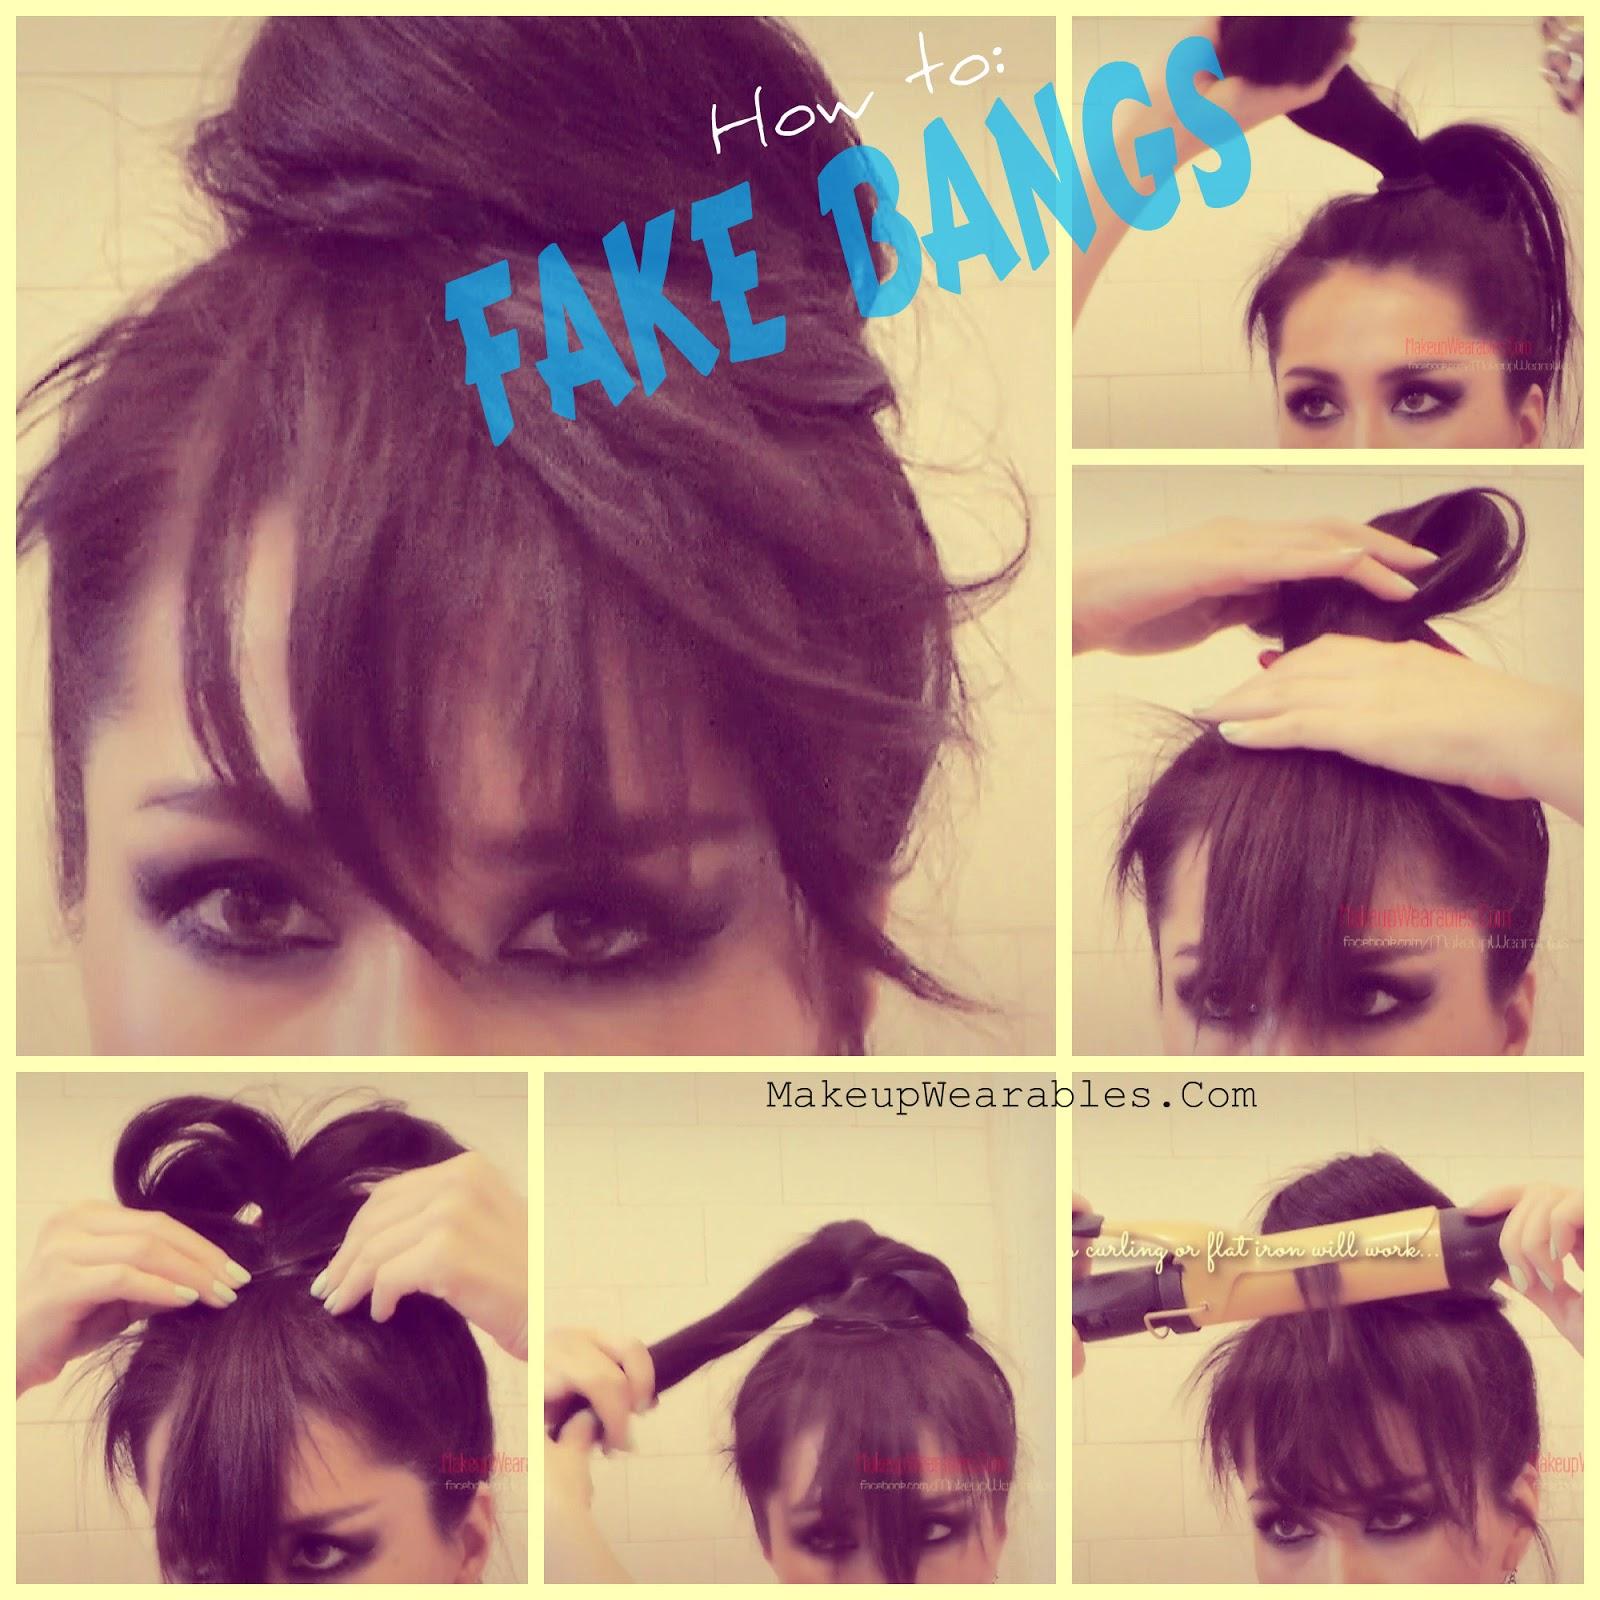 Astounding How To Fake Bangs Cute Easy Bun Hairstyles Hair Tutorial Video Short Hairstyles For Black Women Fulllsitofus